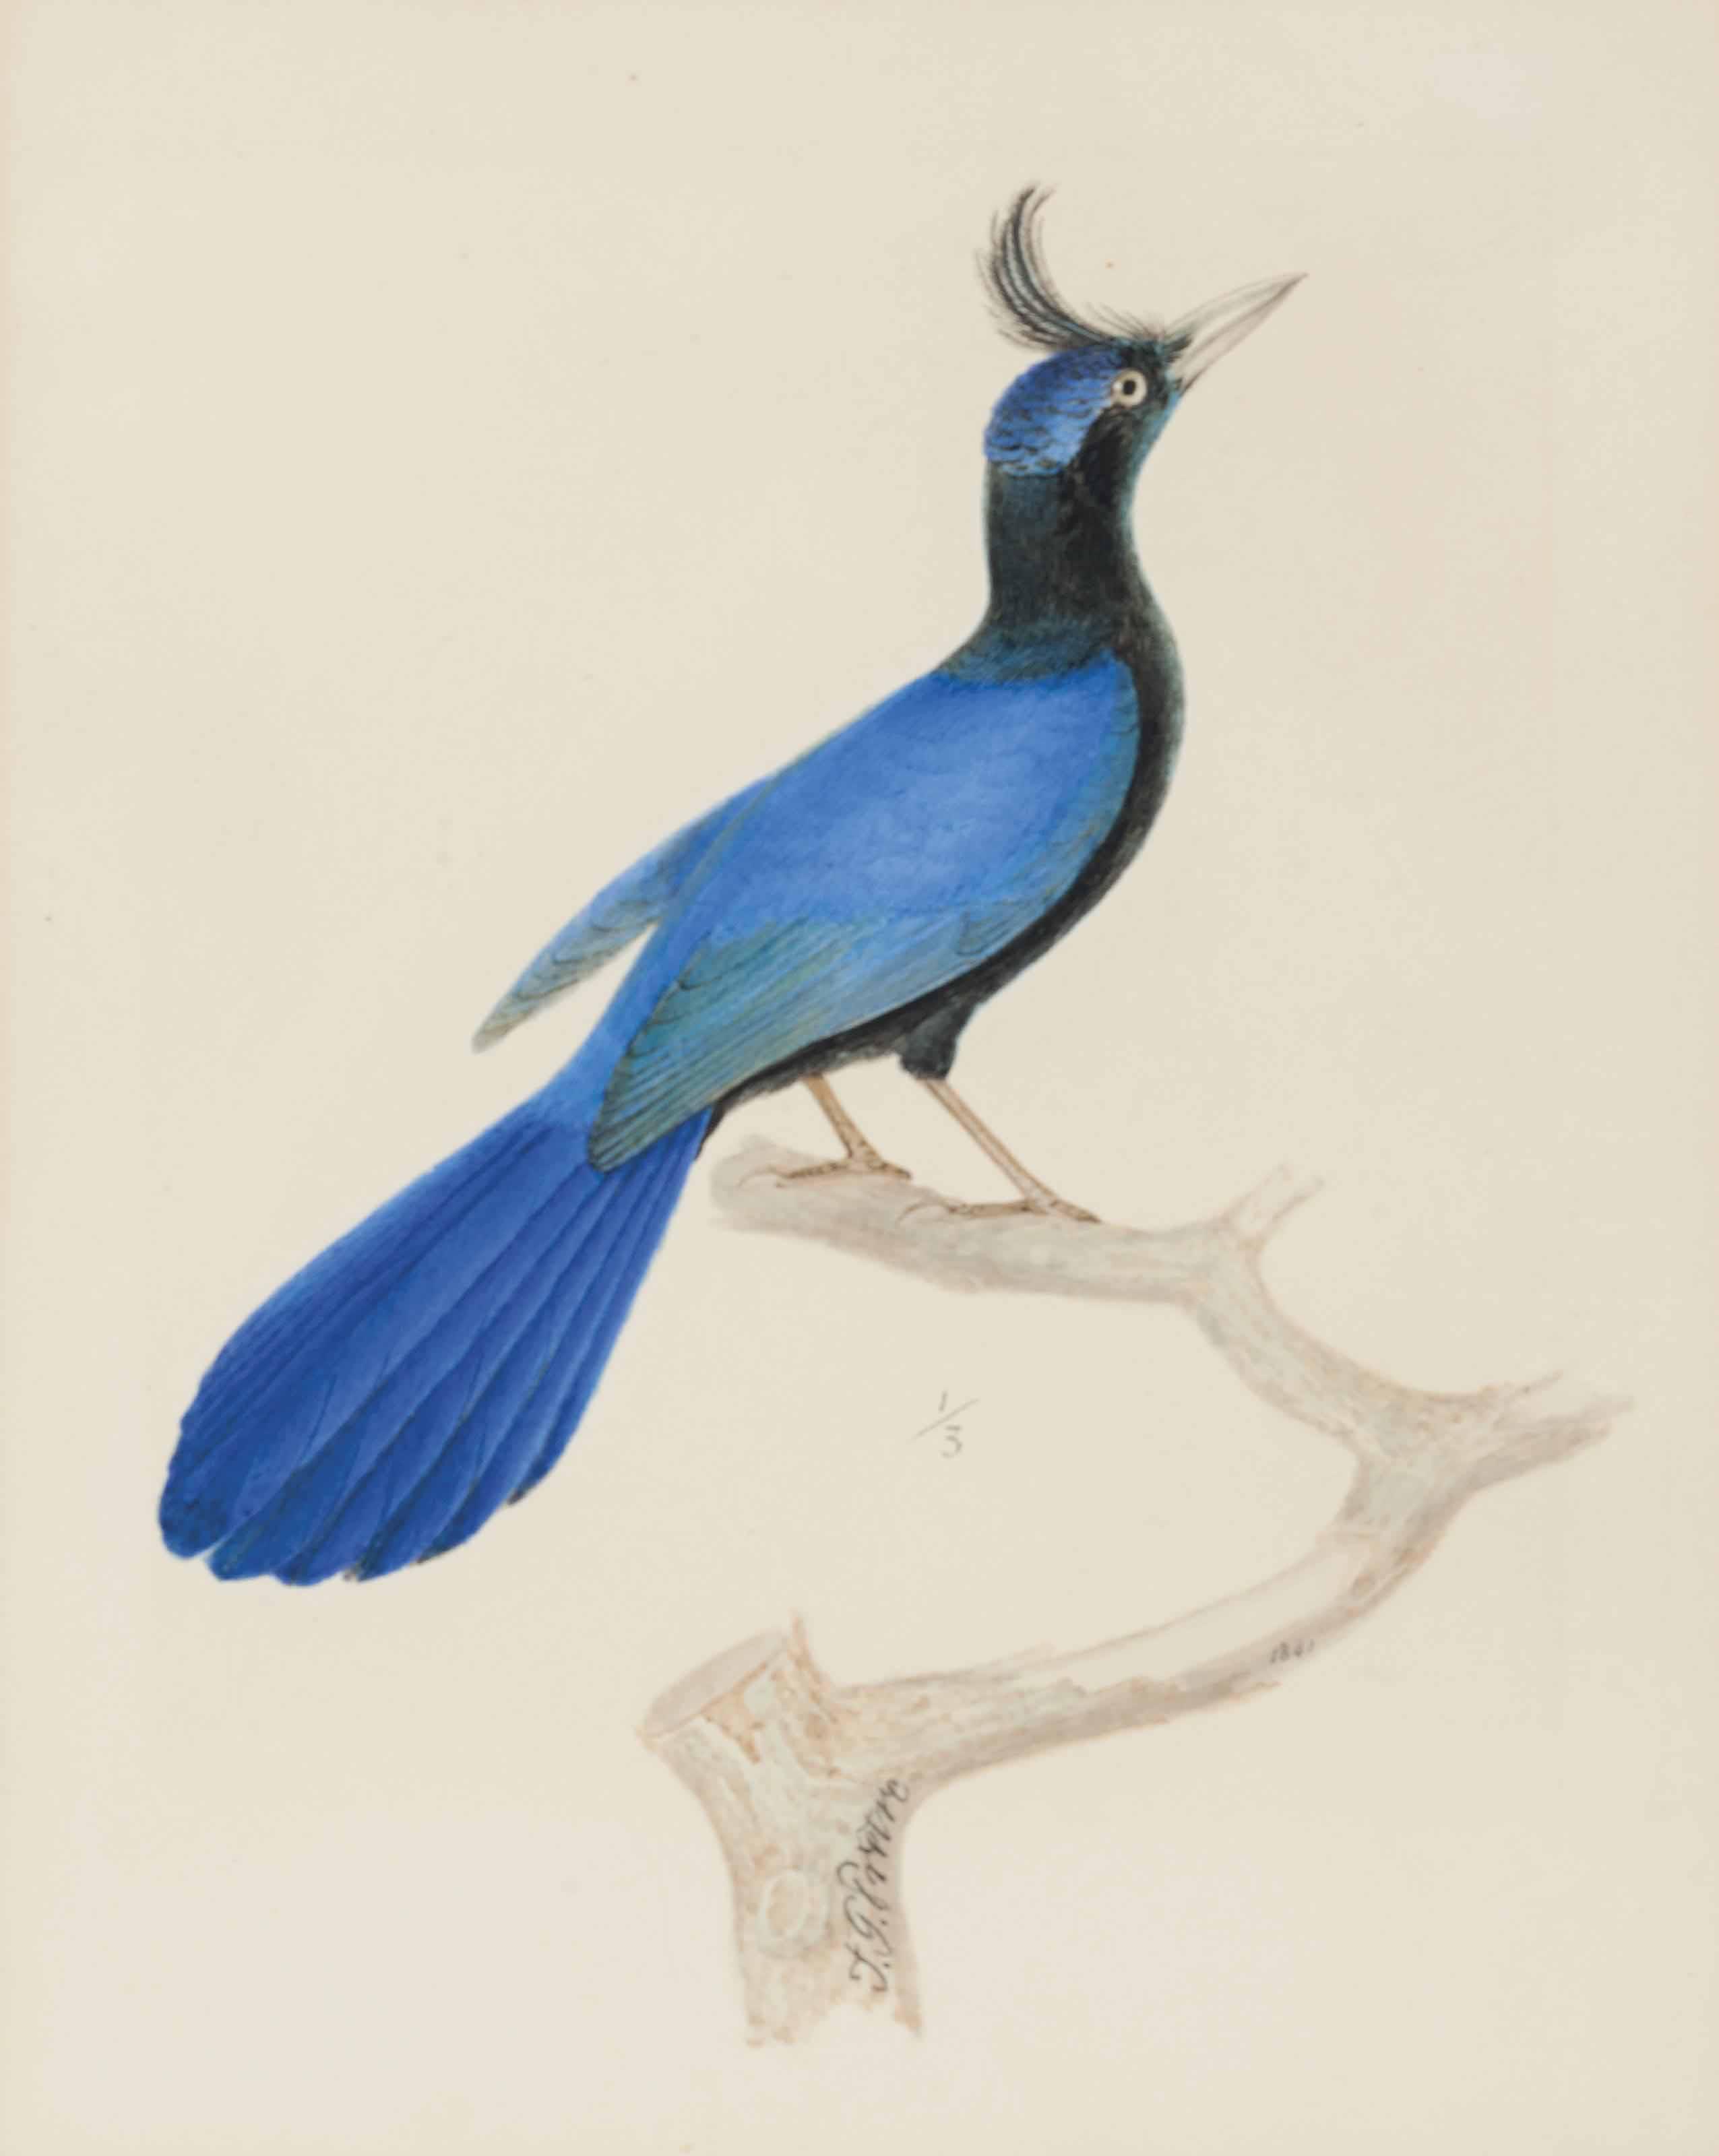 A blue bird of paradise